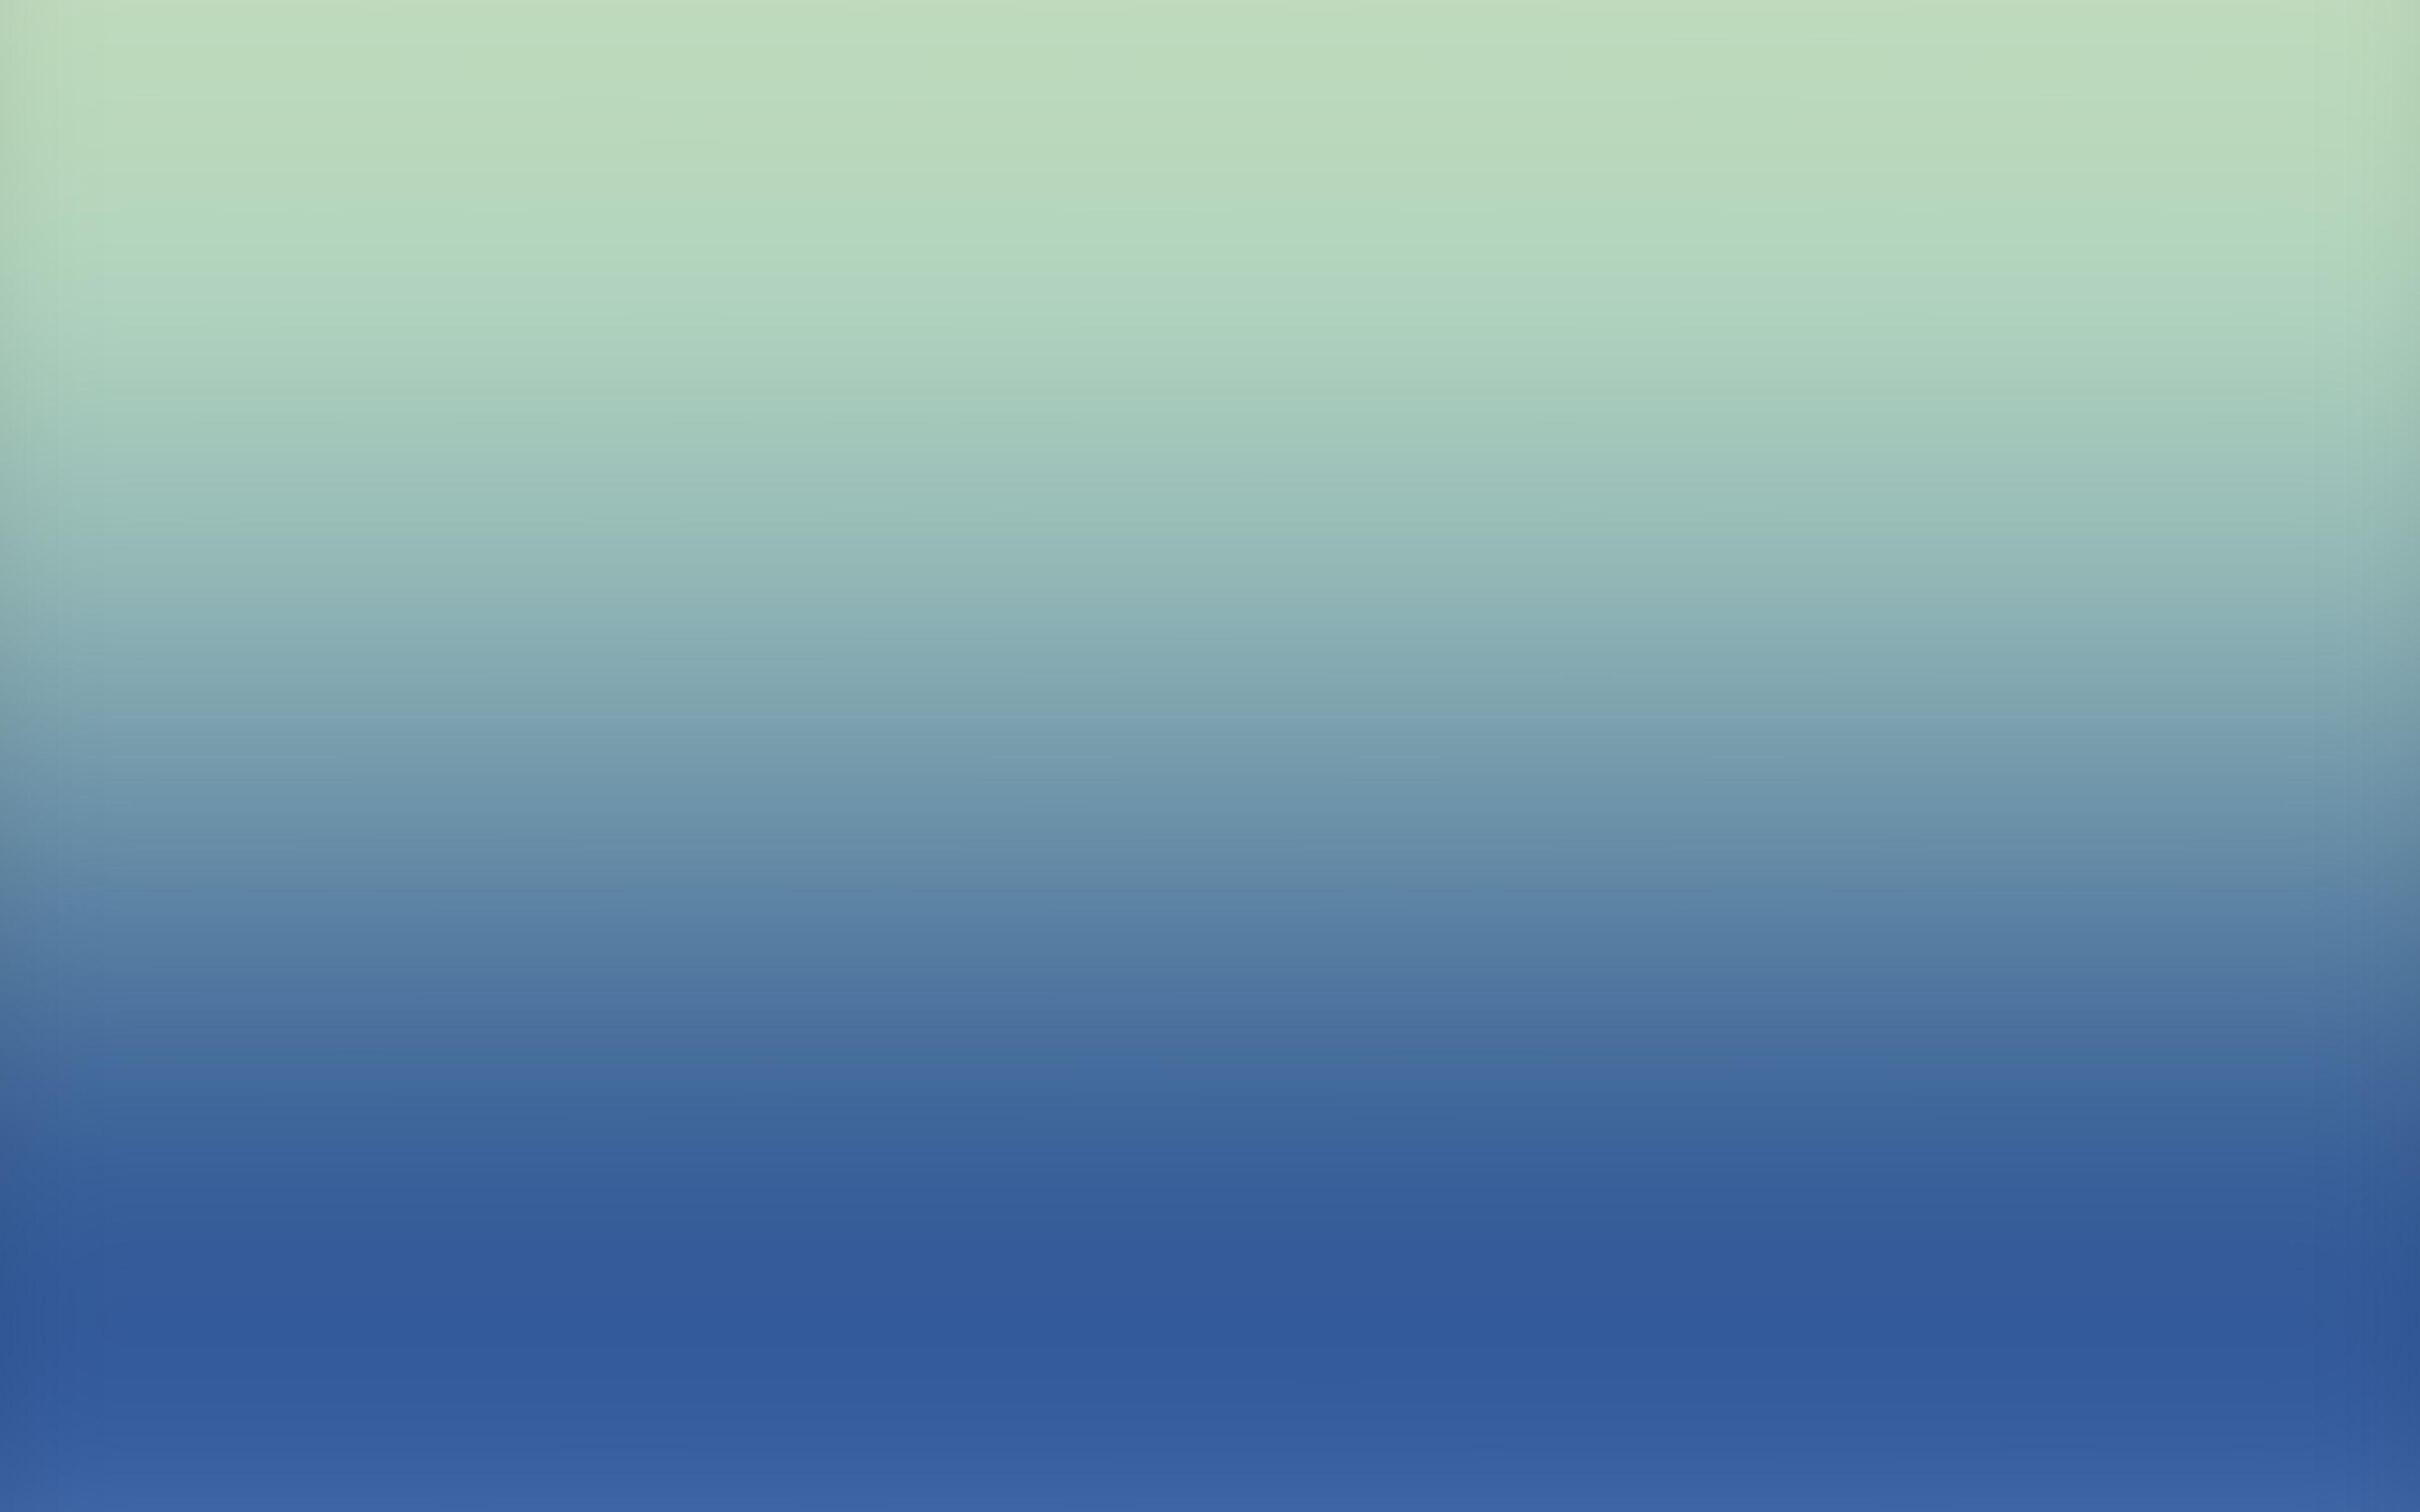 wallpapers for macbook air 13.3